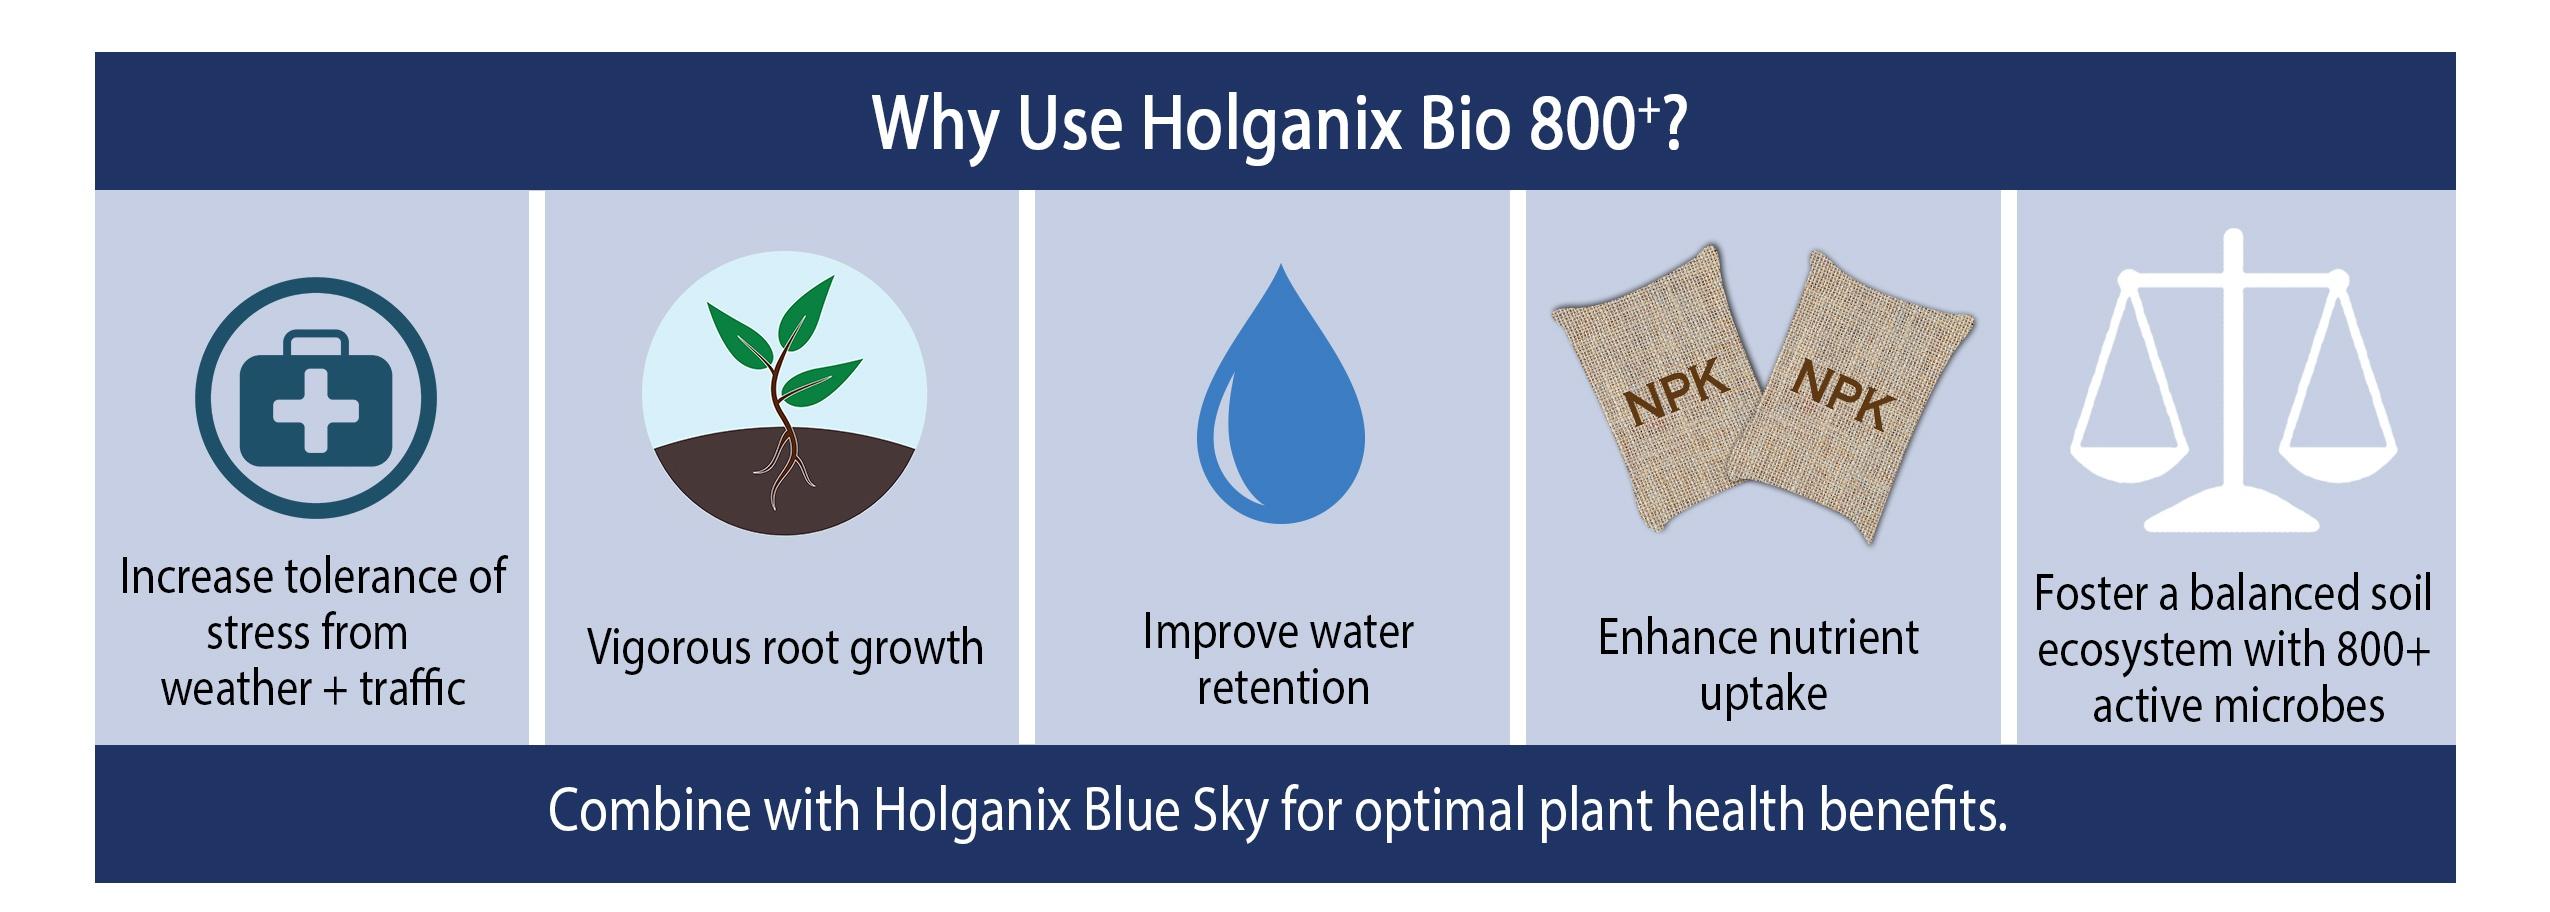 WA Why use Holganix bio 800-1.jpg